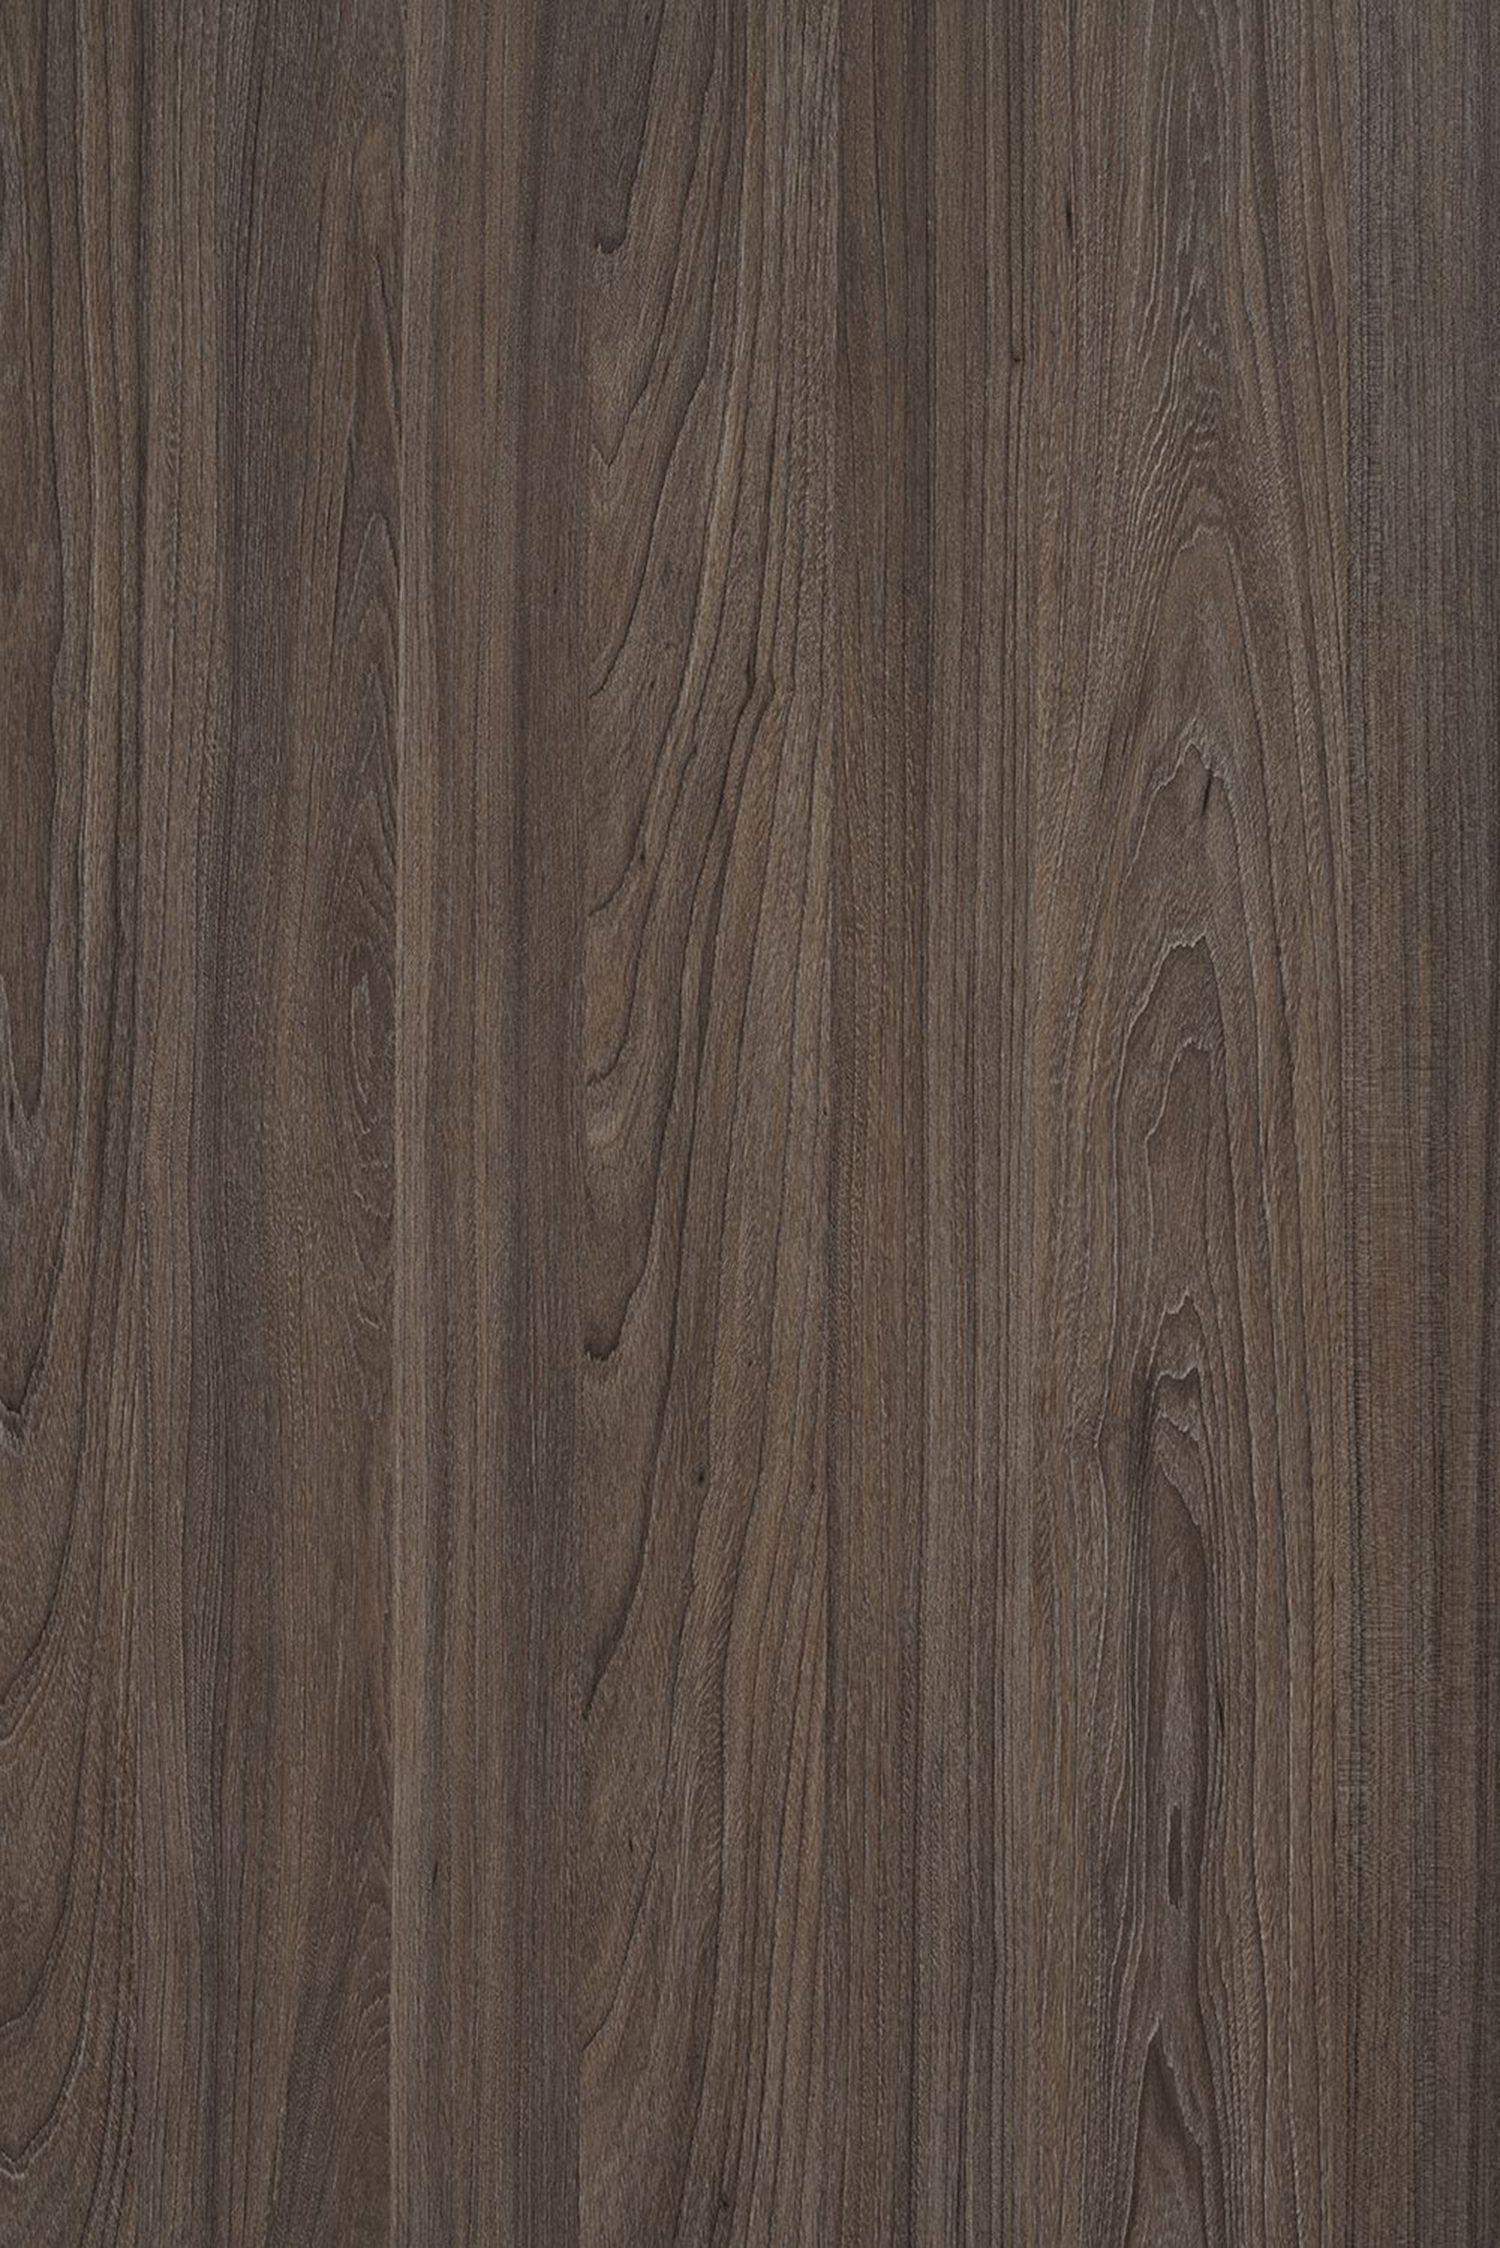 Real Plywood Vray Material Basel Elm Wood Tile Texture Wood Texture Veneer Texture